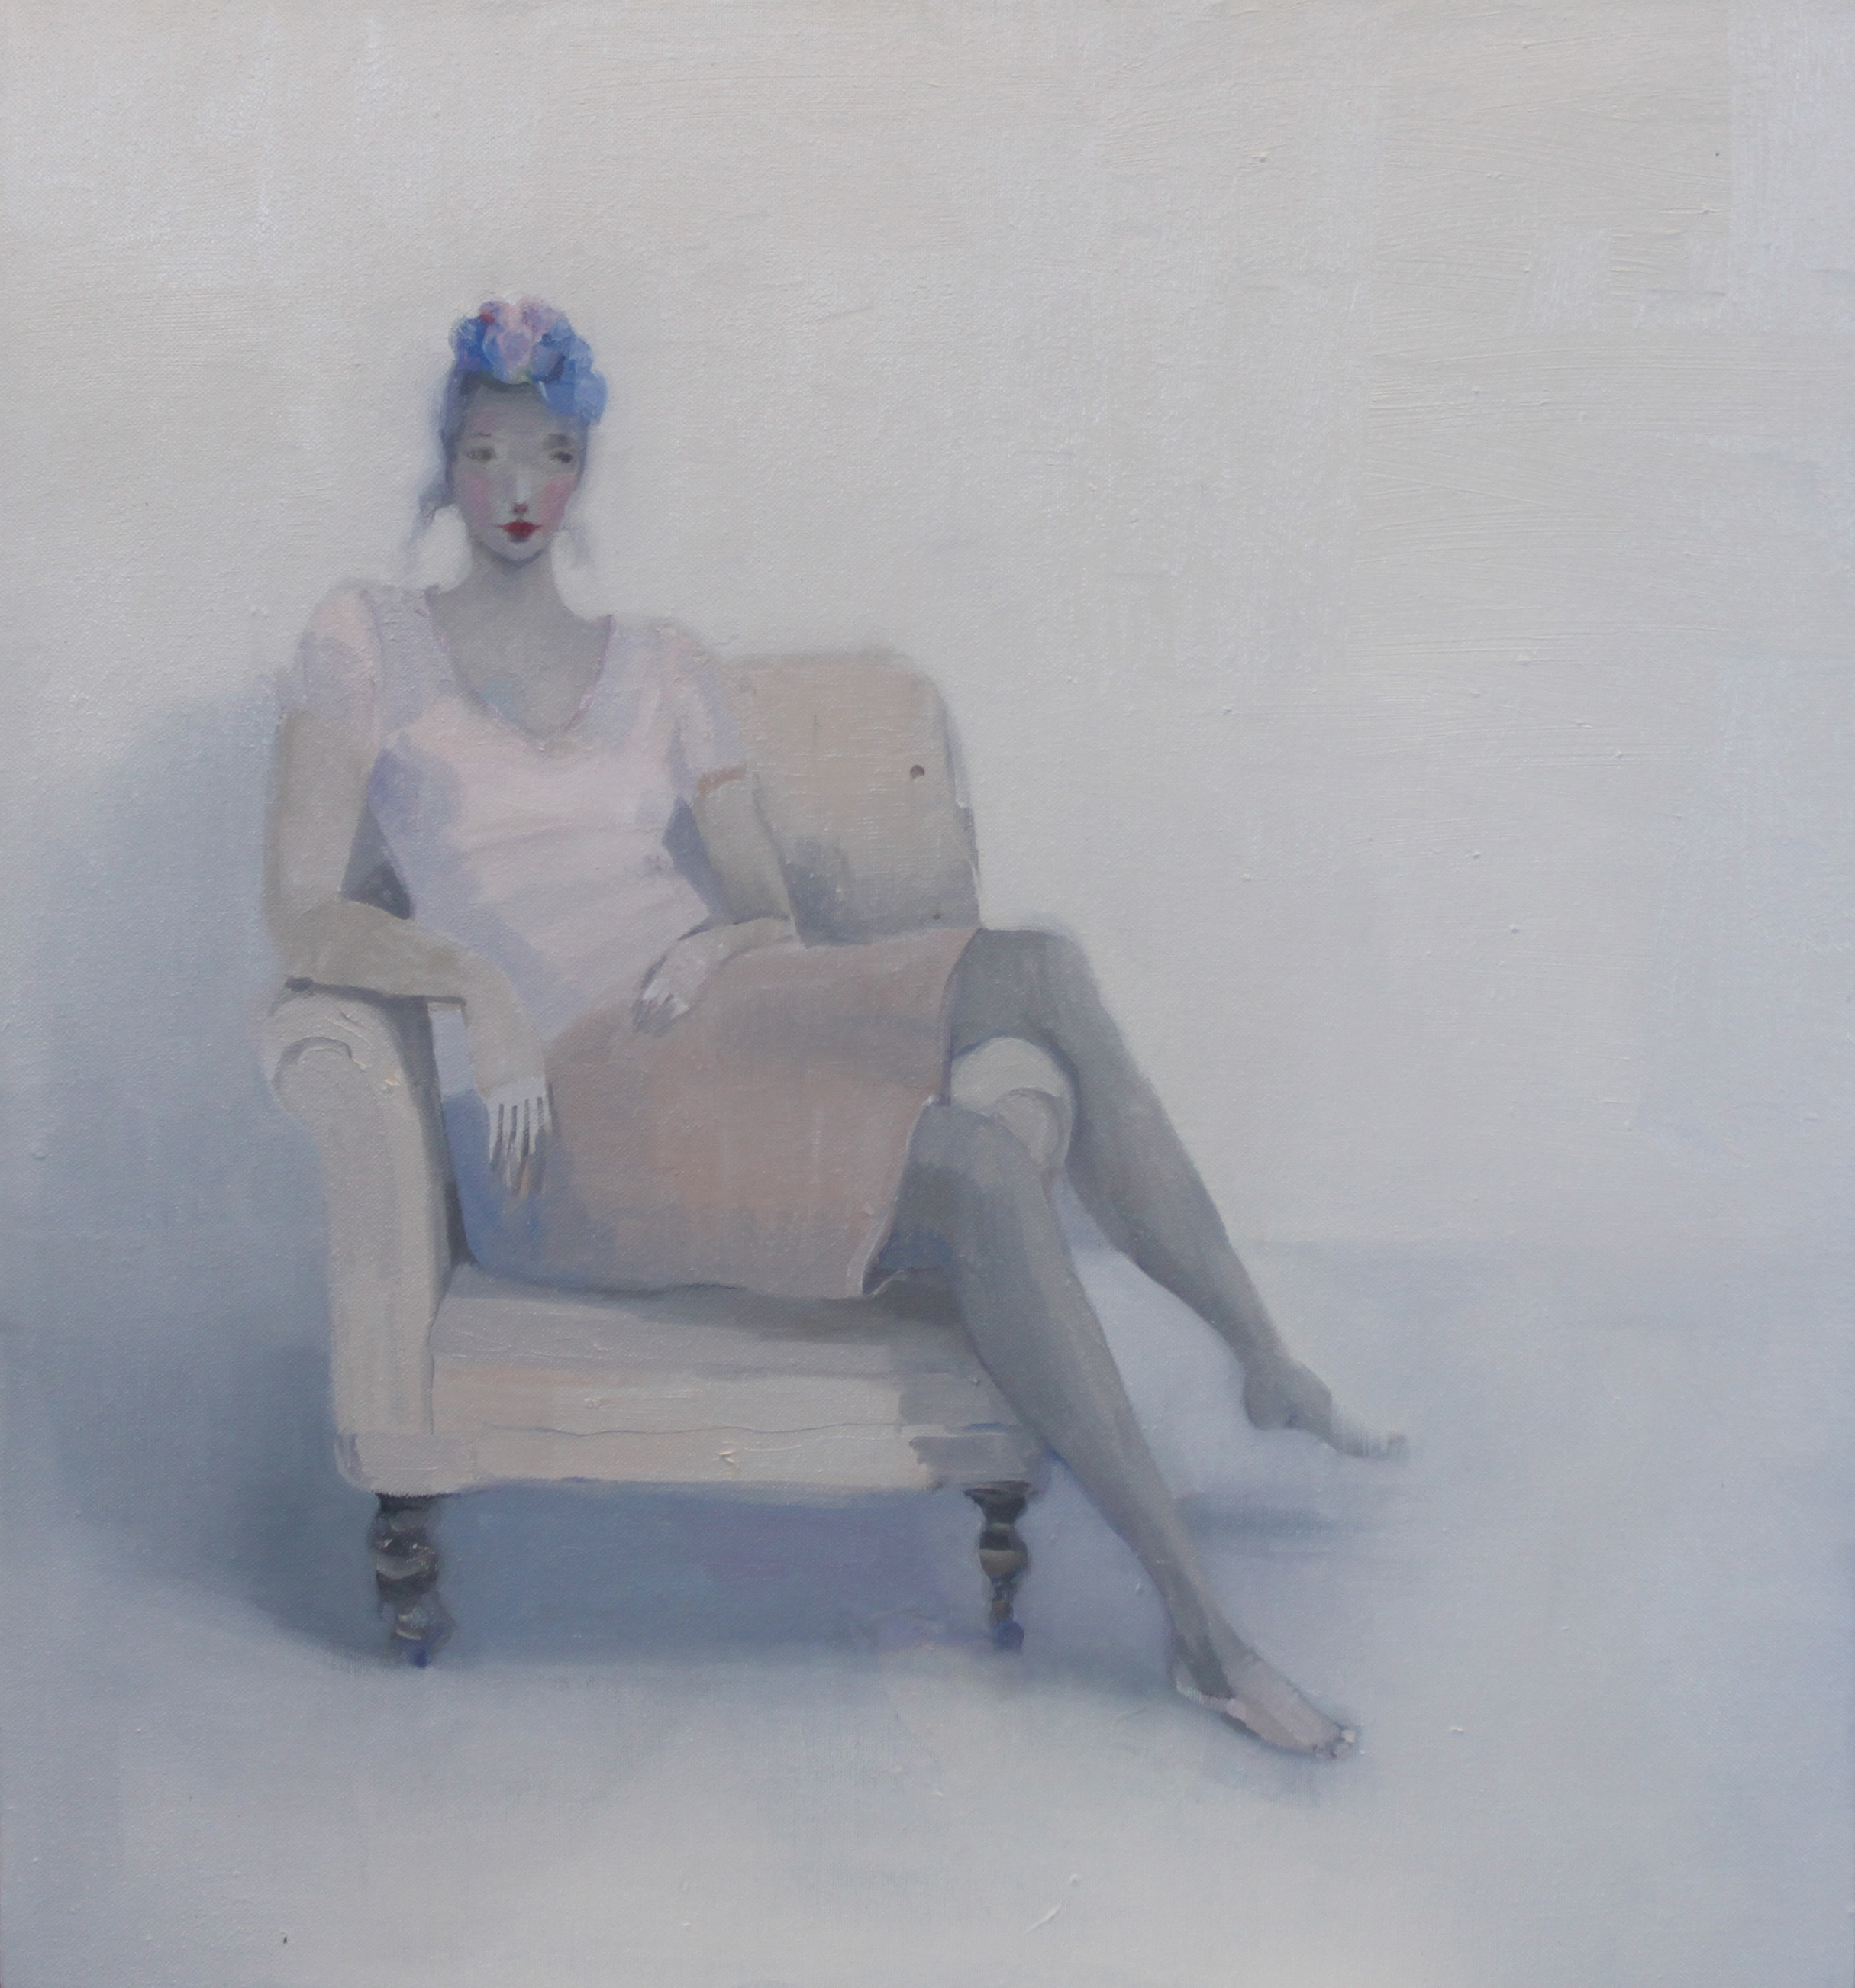 K r i s t i n V e s t g a r d  In Bluebells 60 x 60 cm oil on canvas £ 2500